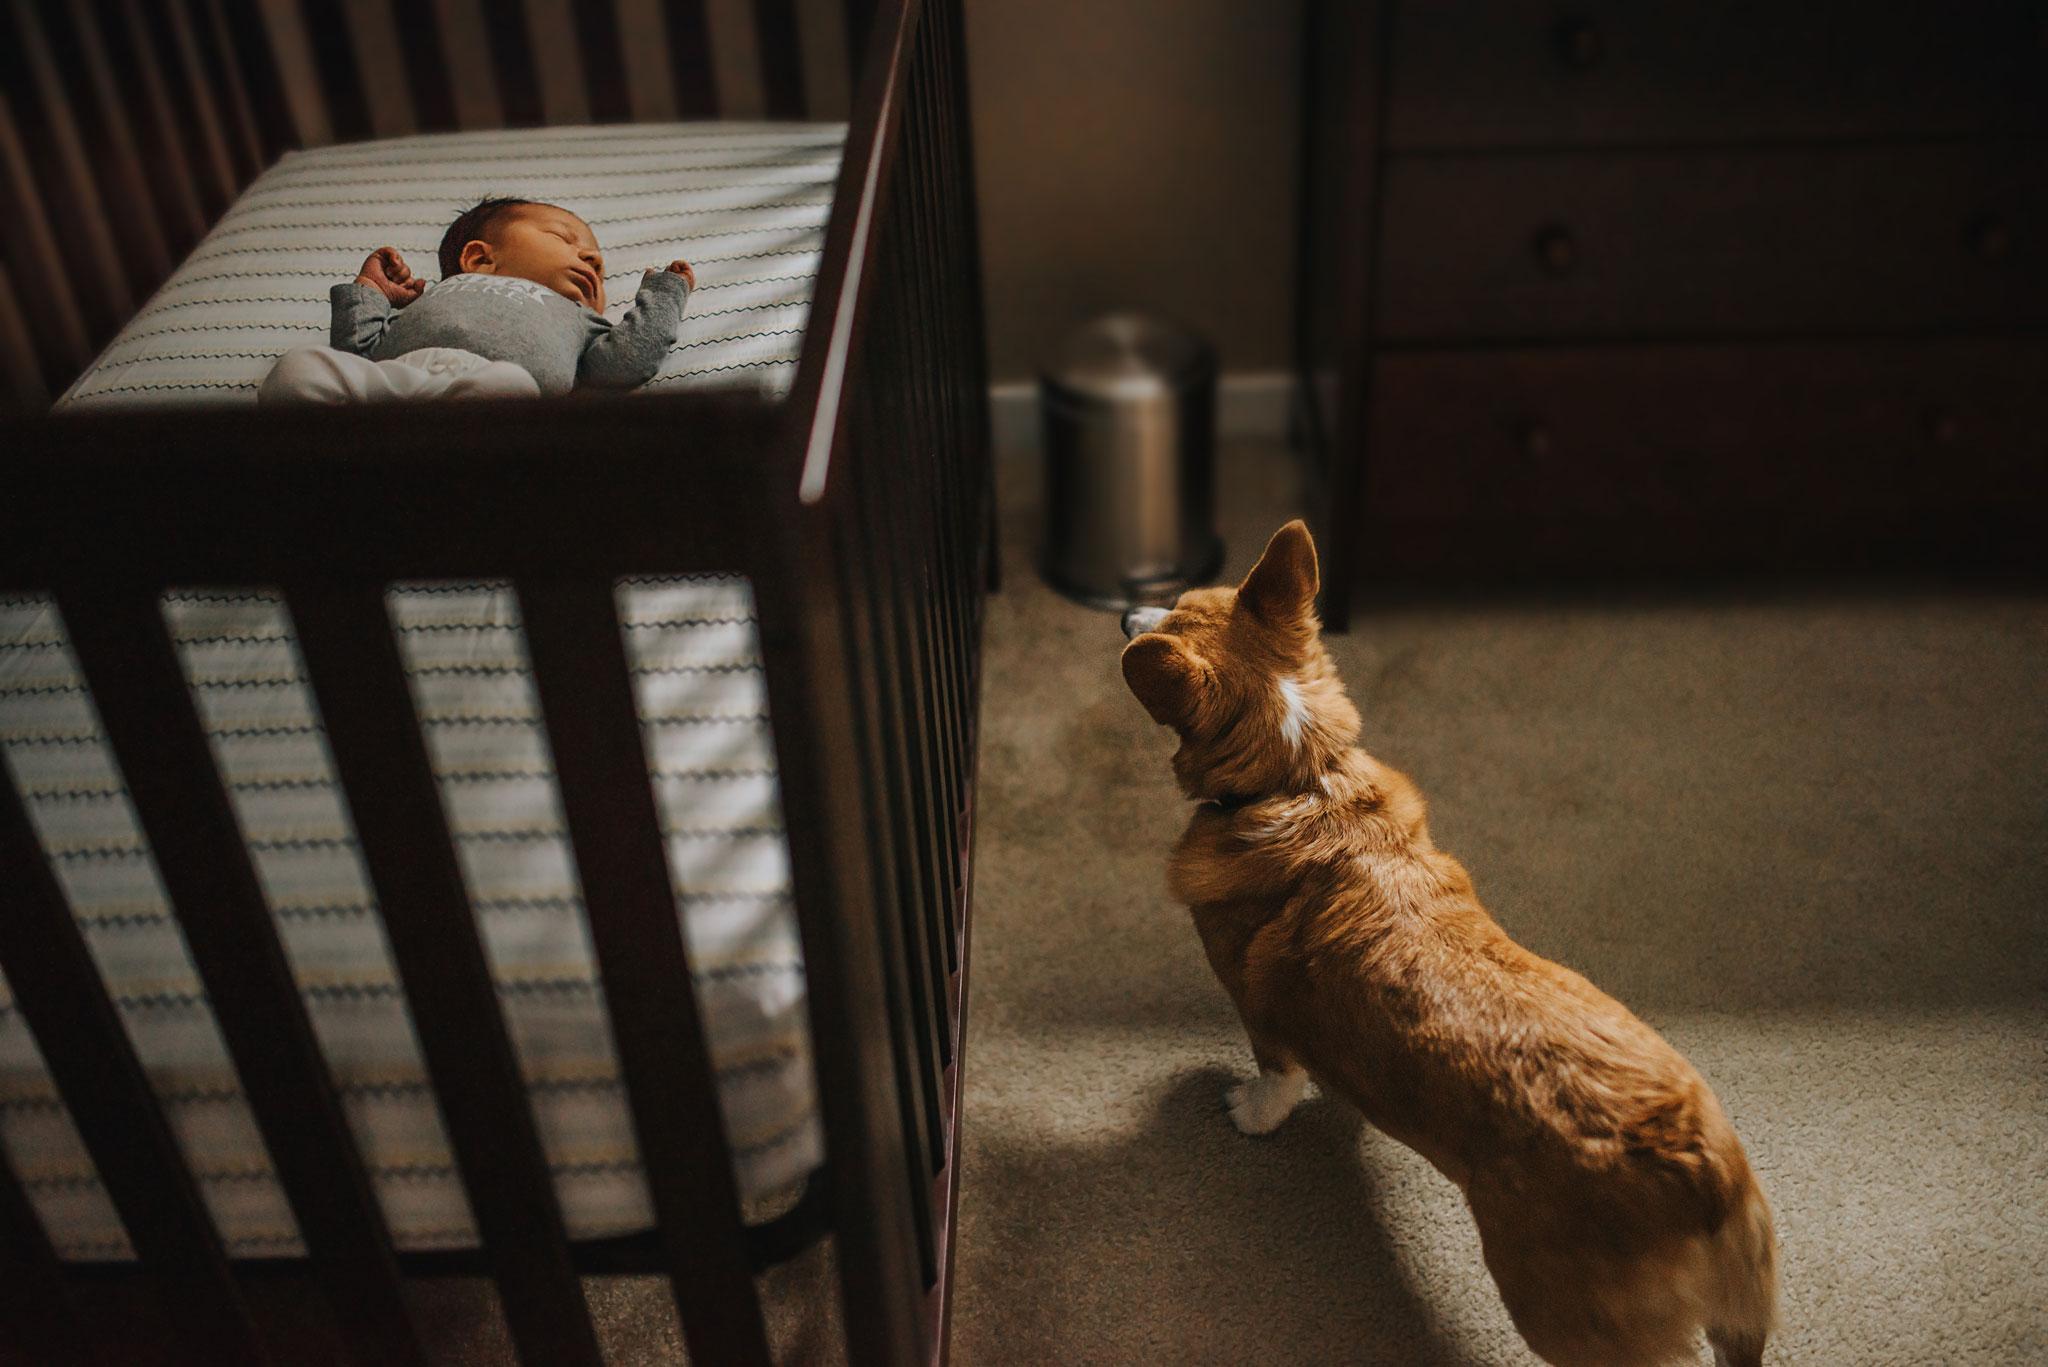 golden aura photography - the newborns experience